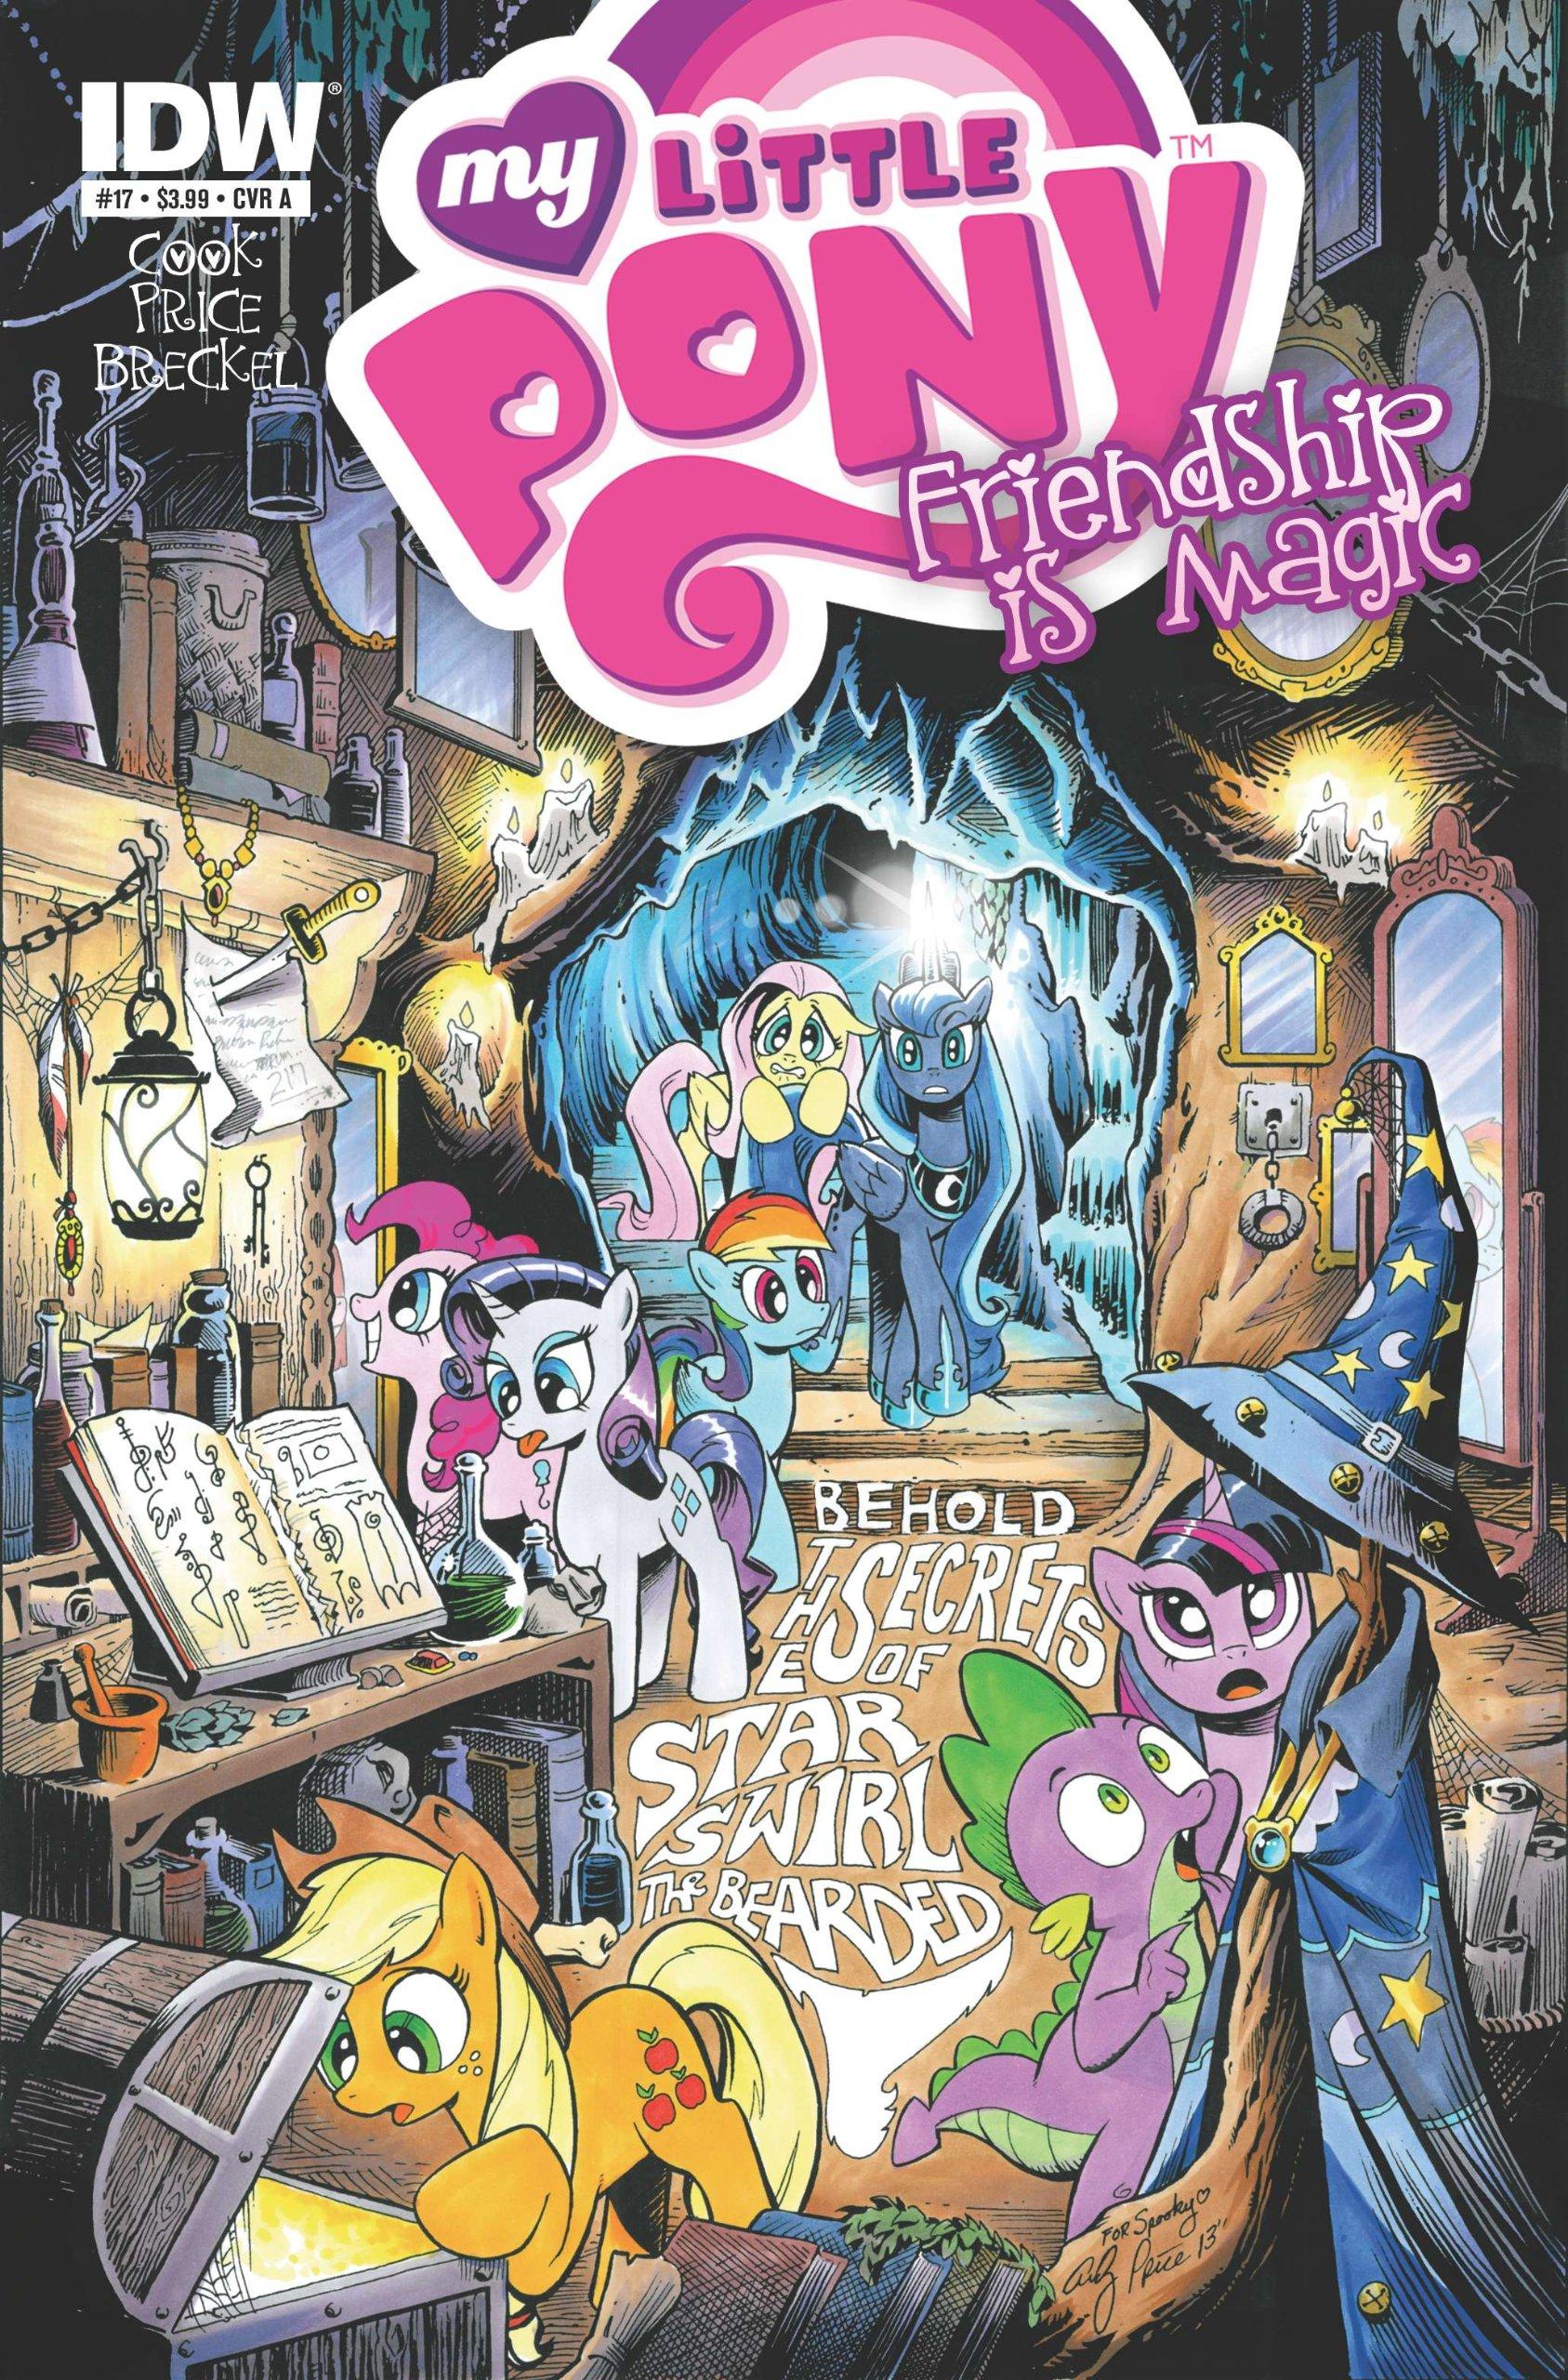 Download My Little Pony Friendship is Magic #17 (1 of 2 CVRs) 2014 *IDW Comics* ebook